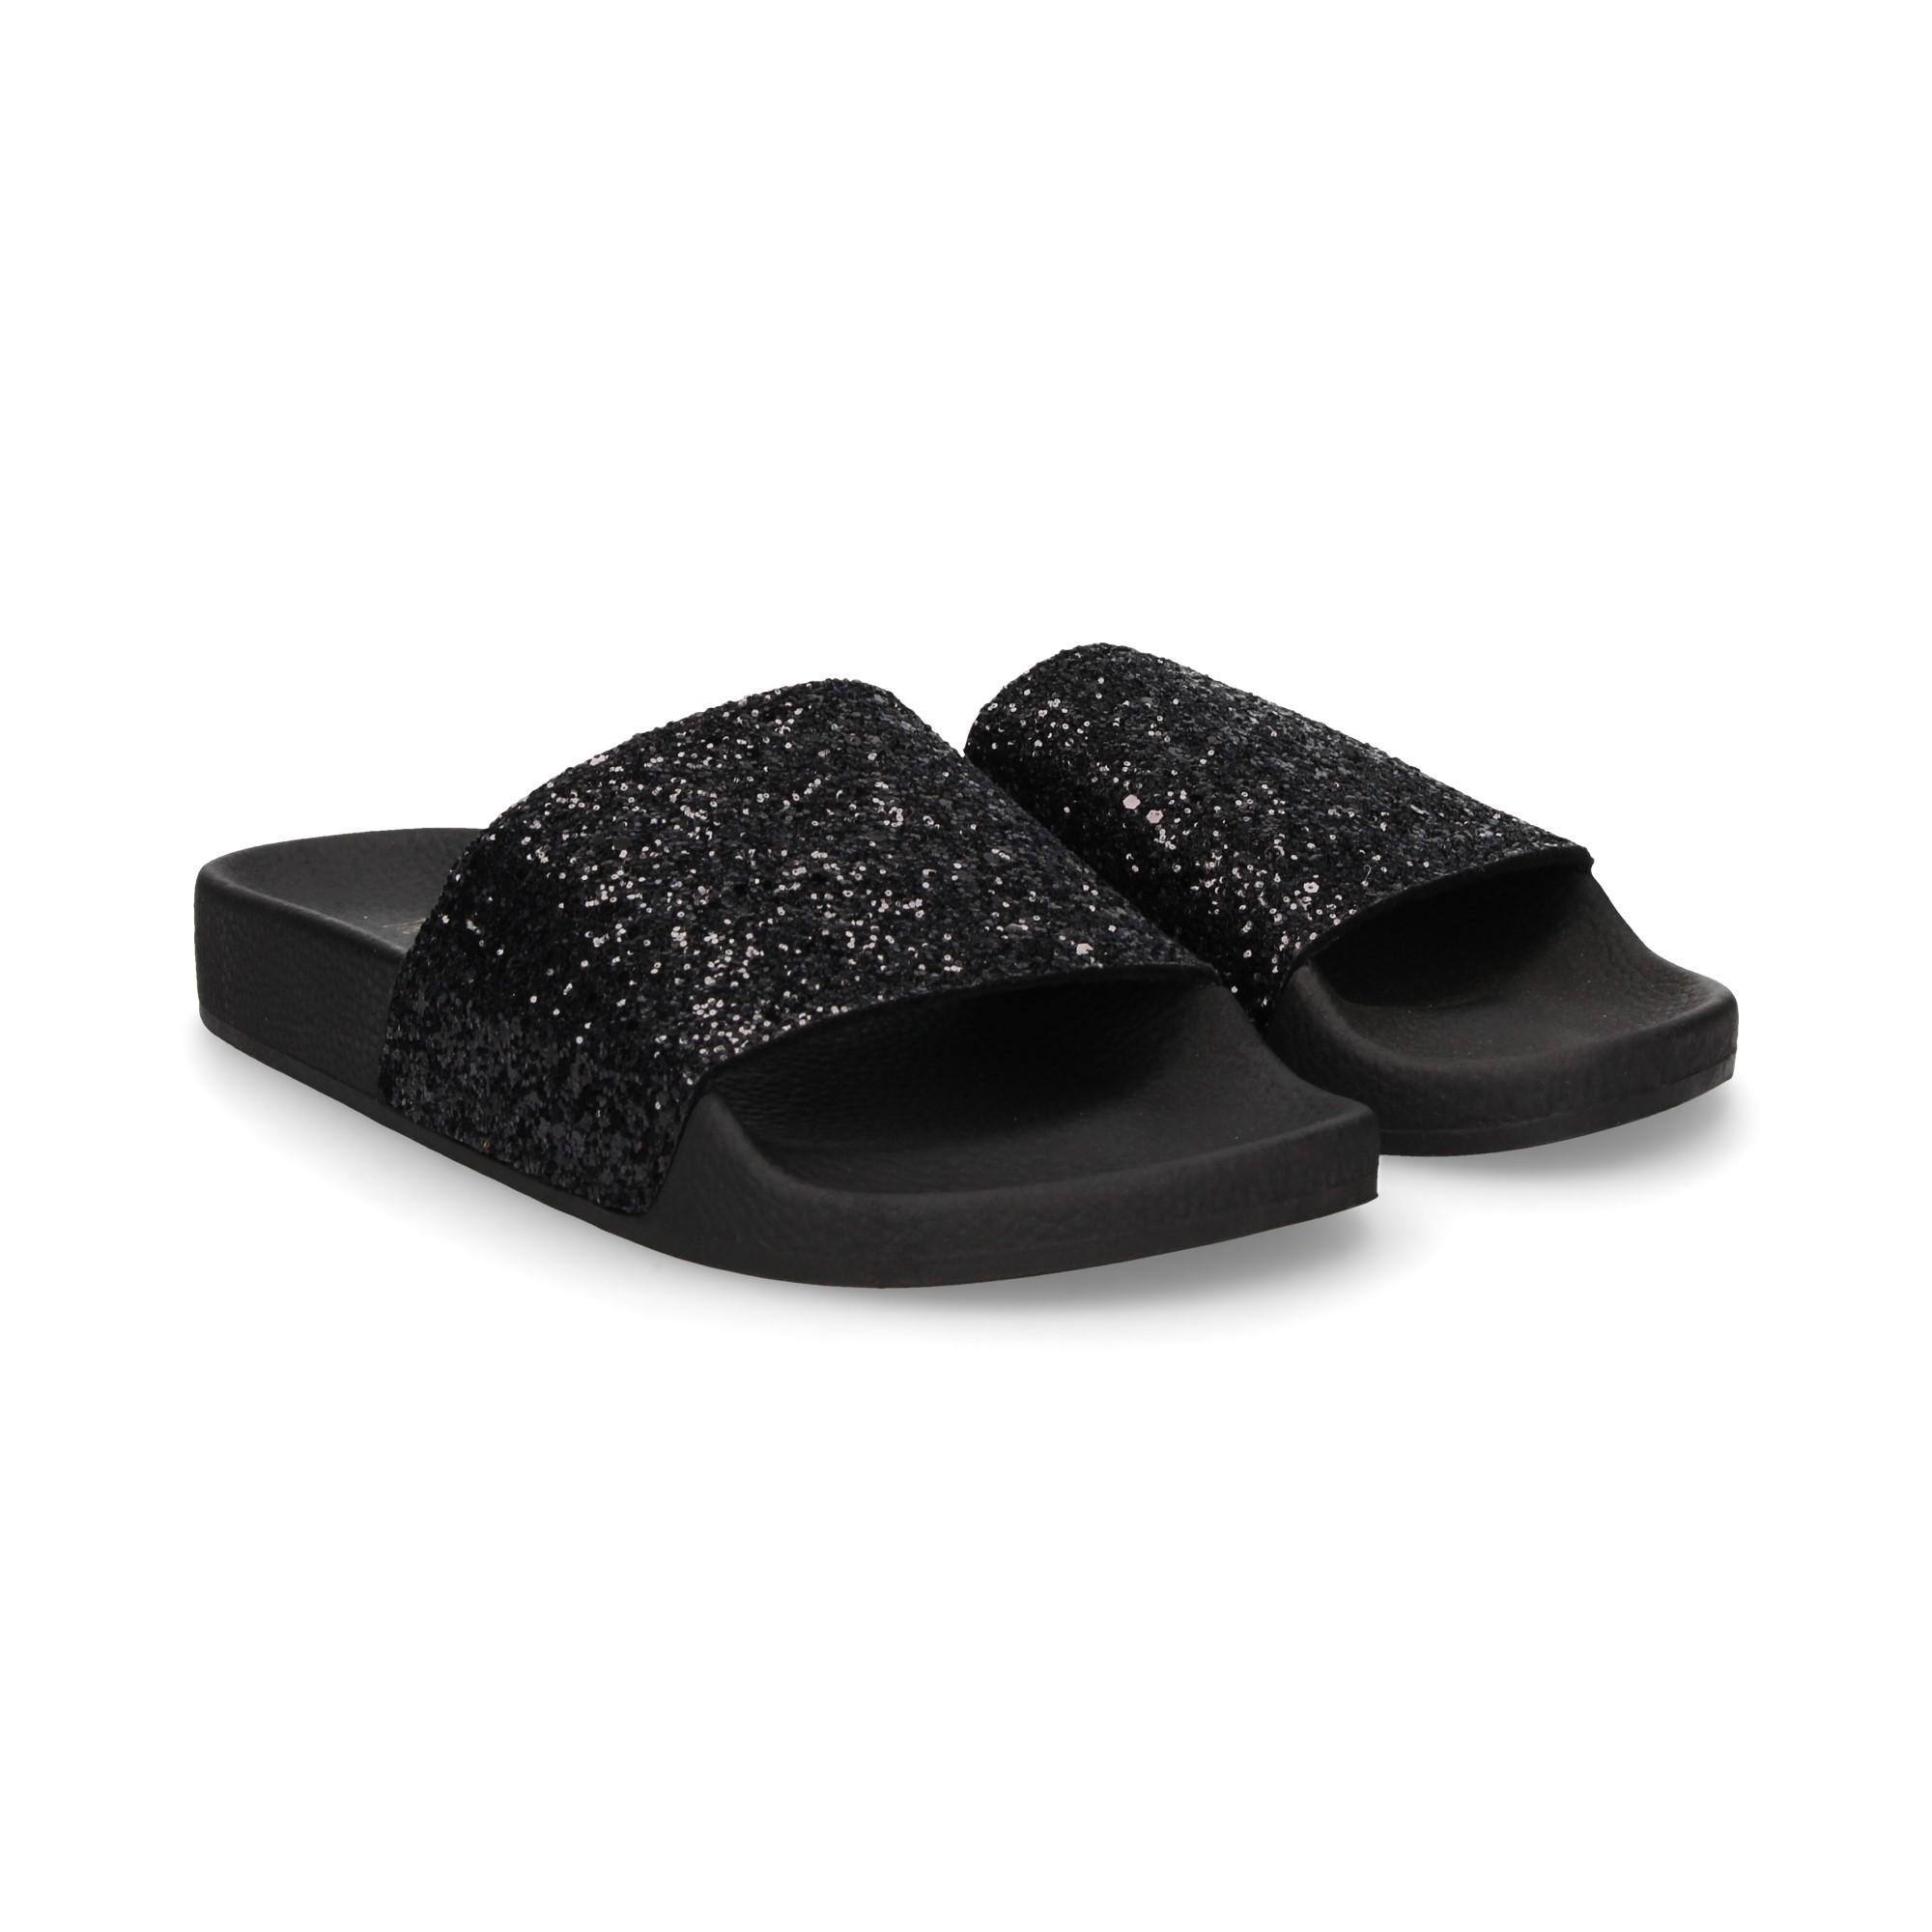 Damen L0020 Brand Negro White Flache Für Sandalen The nv0wP8ymNO